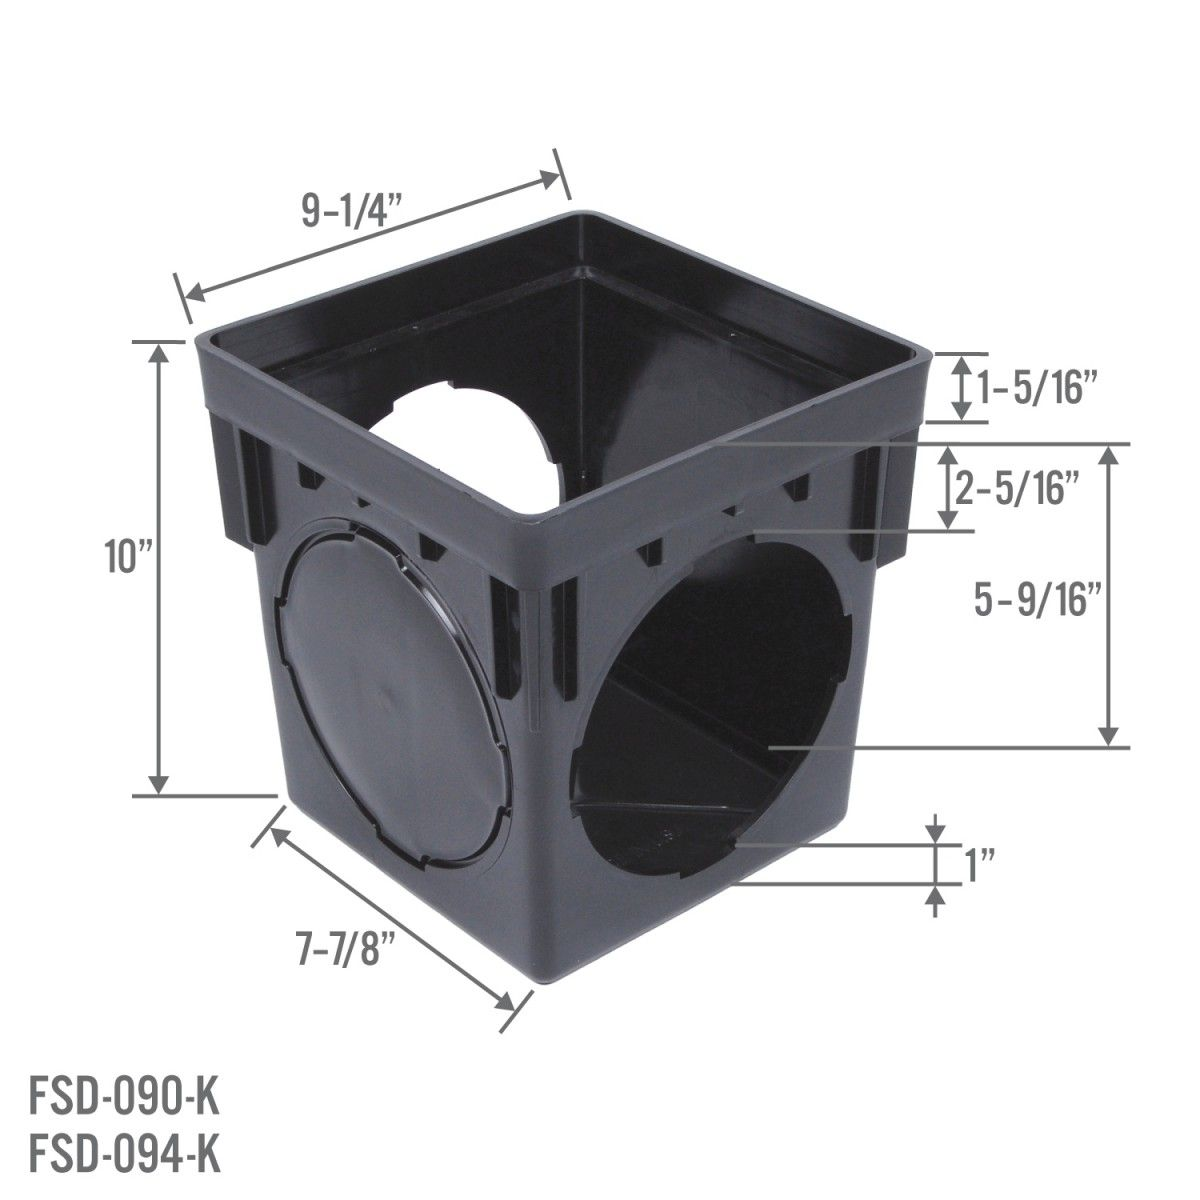 Stormdrain Fsd 094 K 9 Inch Square Black Catch Basin Drain Box Kit With Grate And Debris Trap Filter In 2020 With Images Catch Basin Drain Backyard Drainage Landscape Drainage